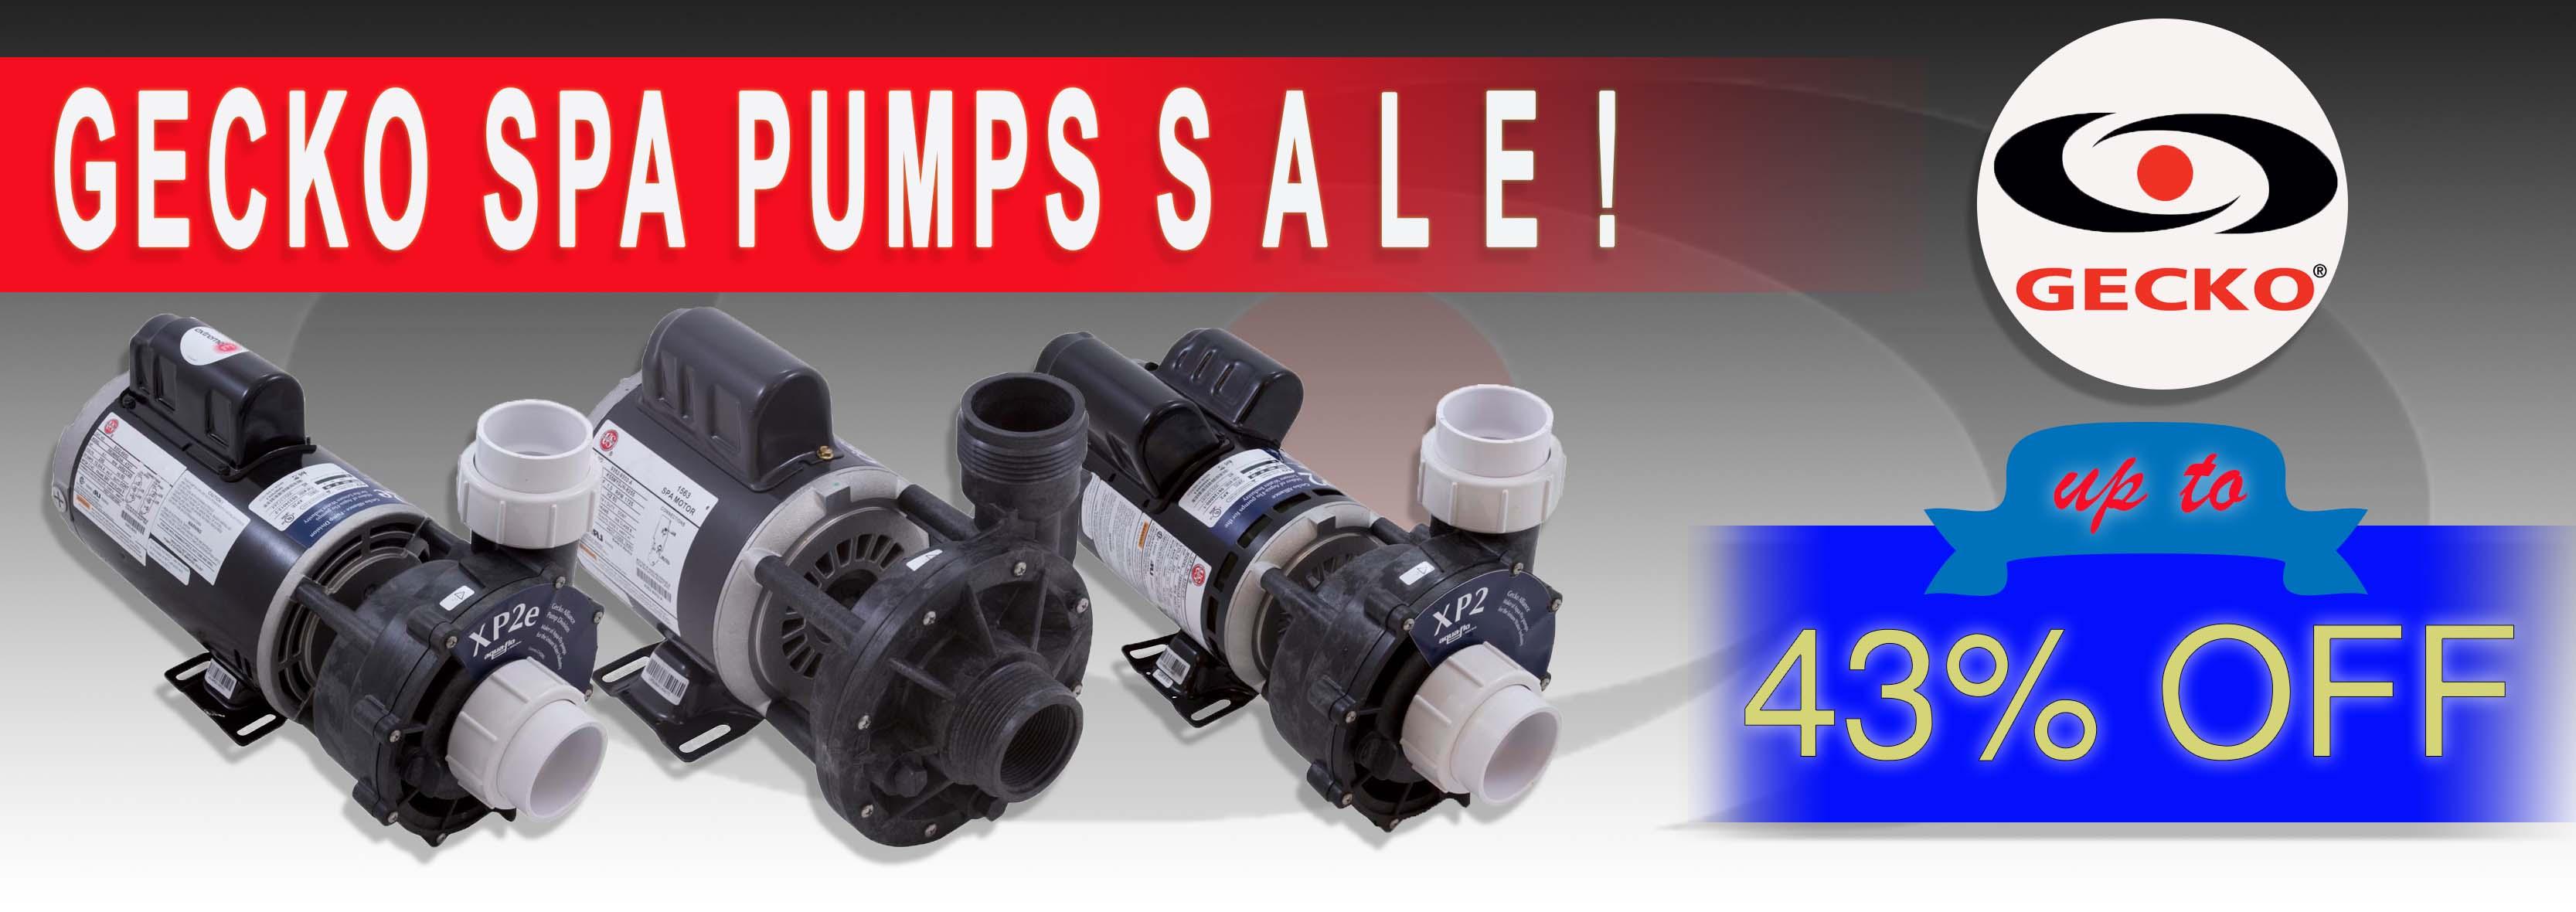 gecko-spa-pump-sale.jpg